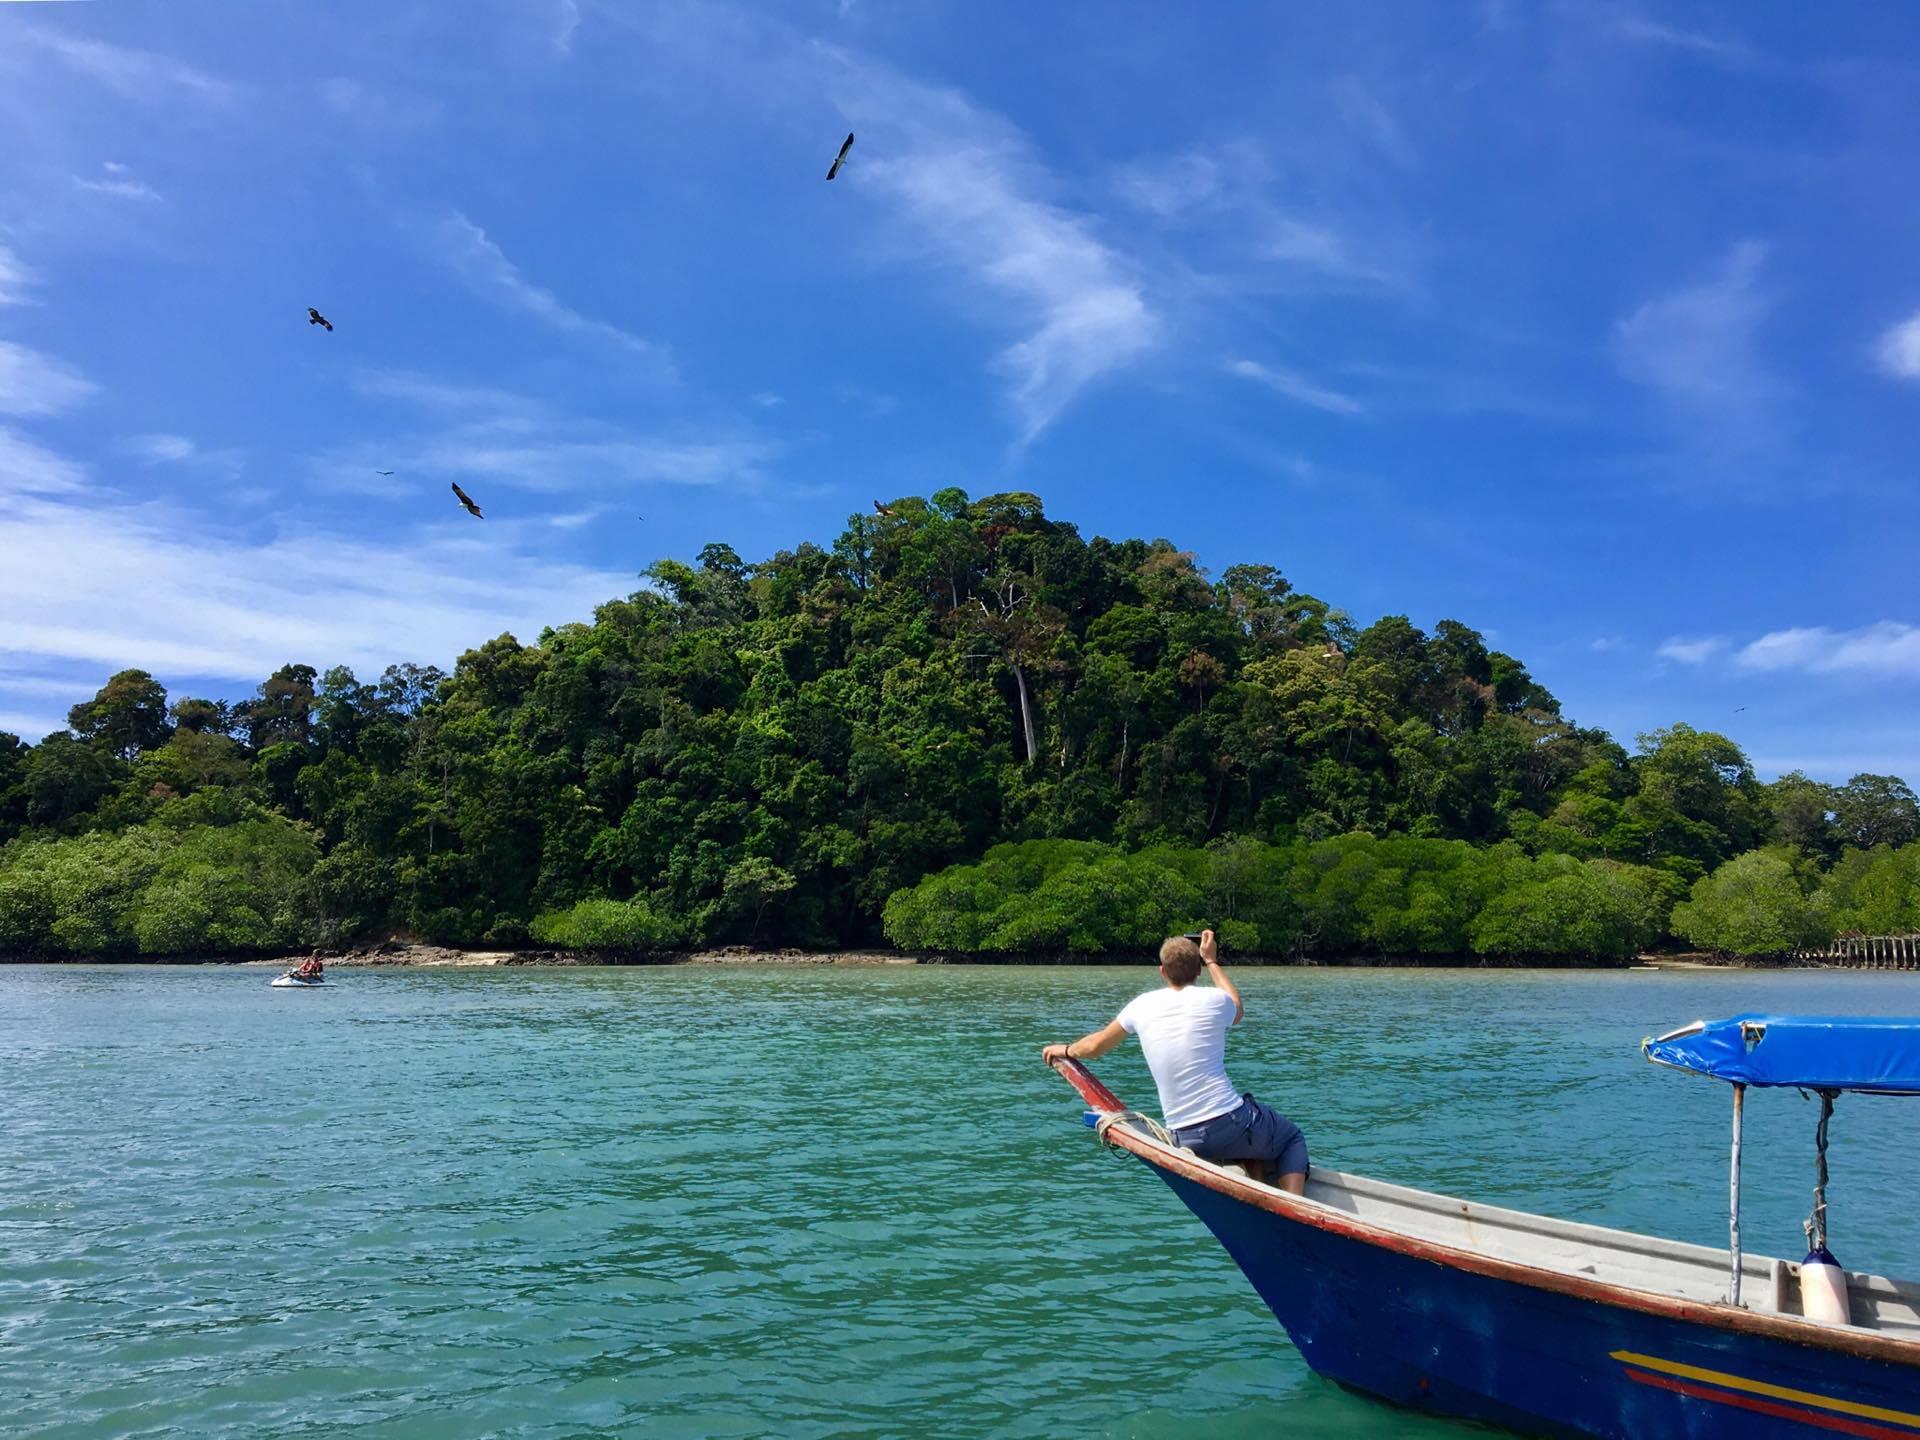 Boating around the island.